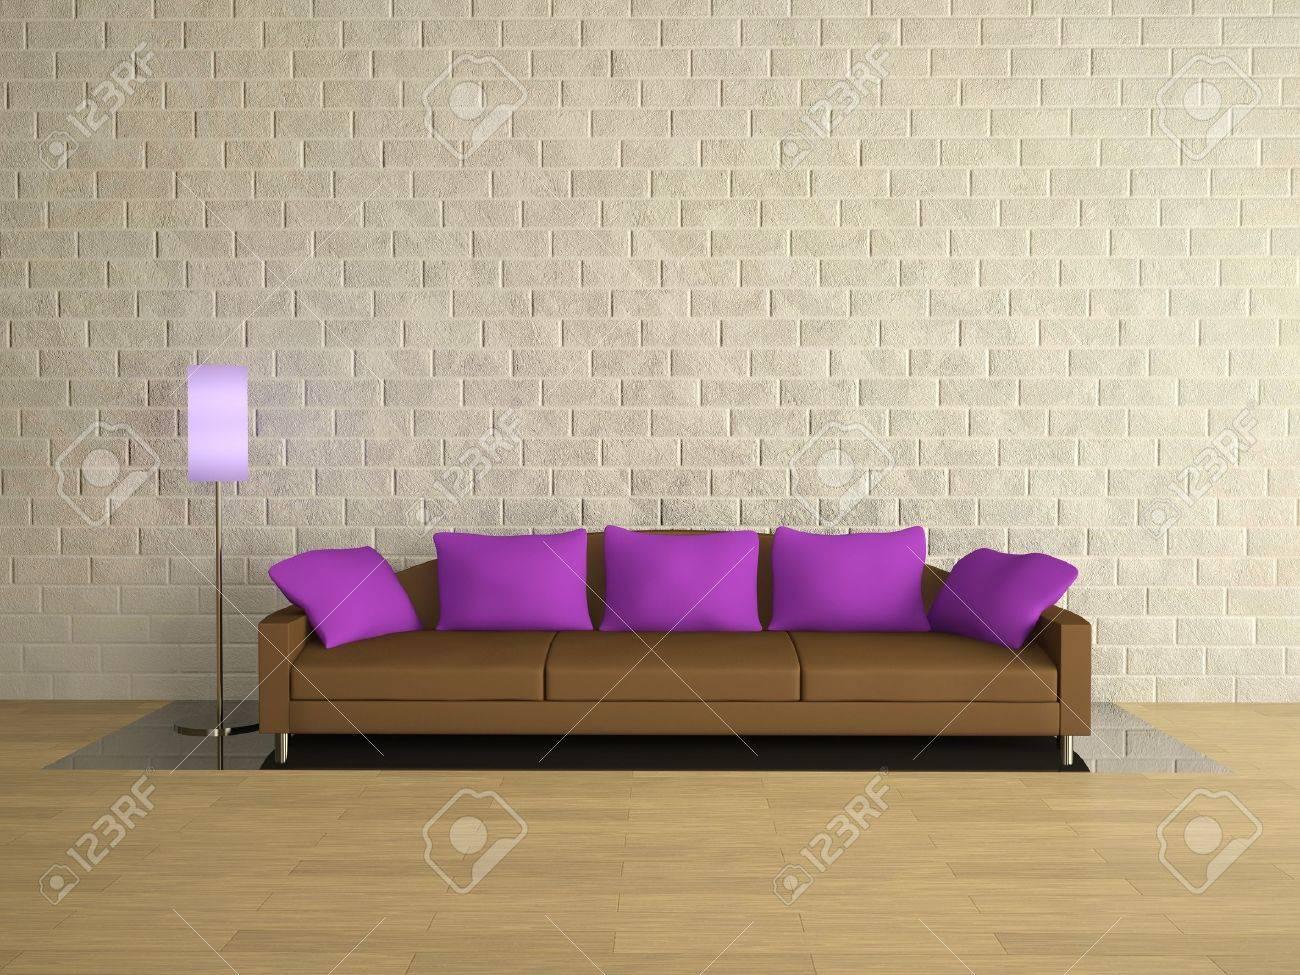 Brown Sofa With Lilac Pillows Near A Brick Wall Stock Photo ...